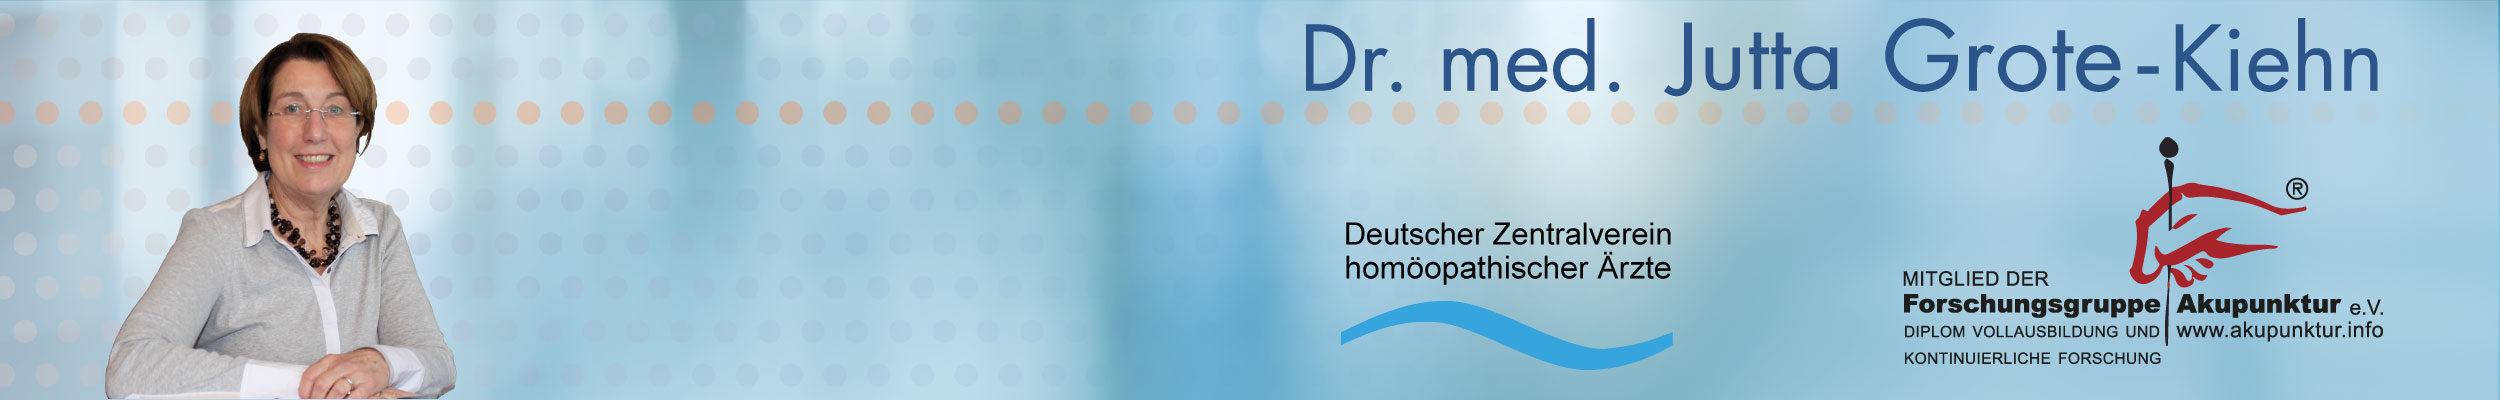 Dr. Grote-Kiehn